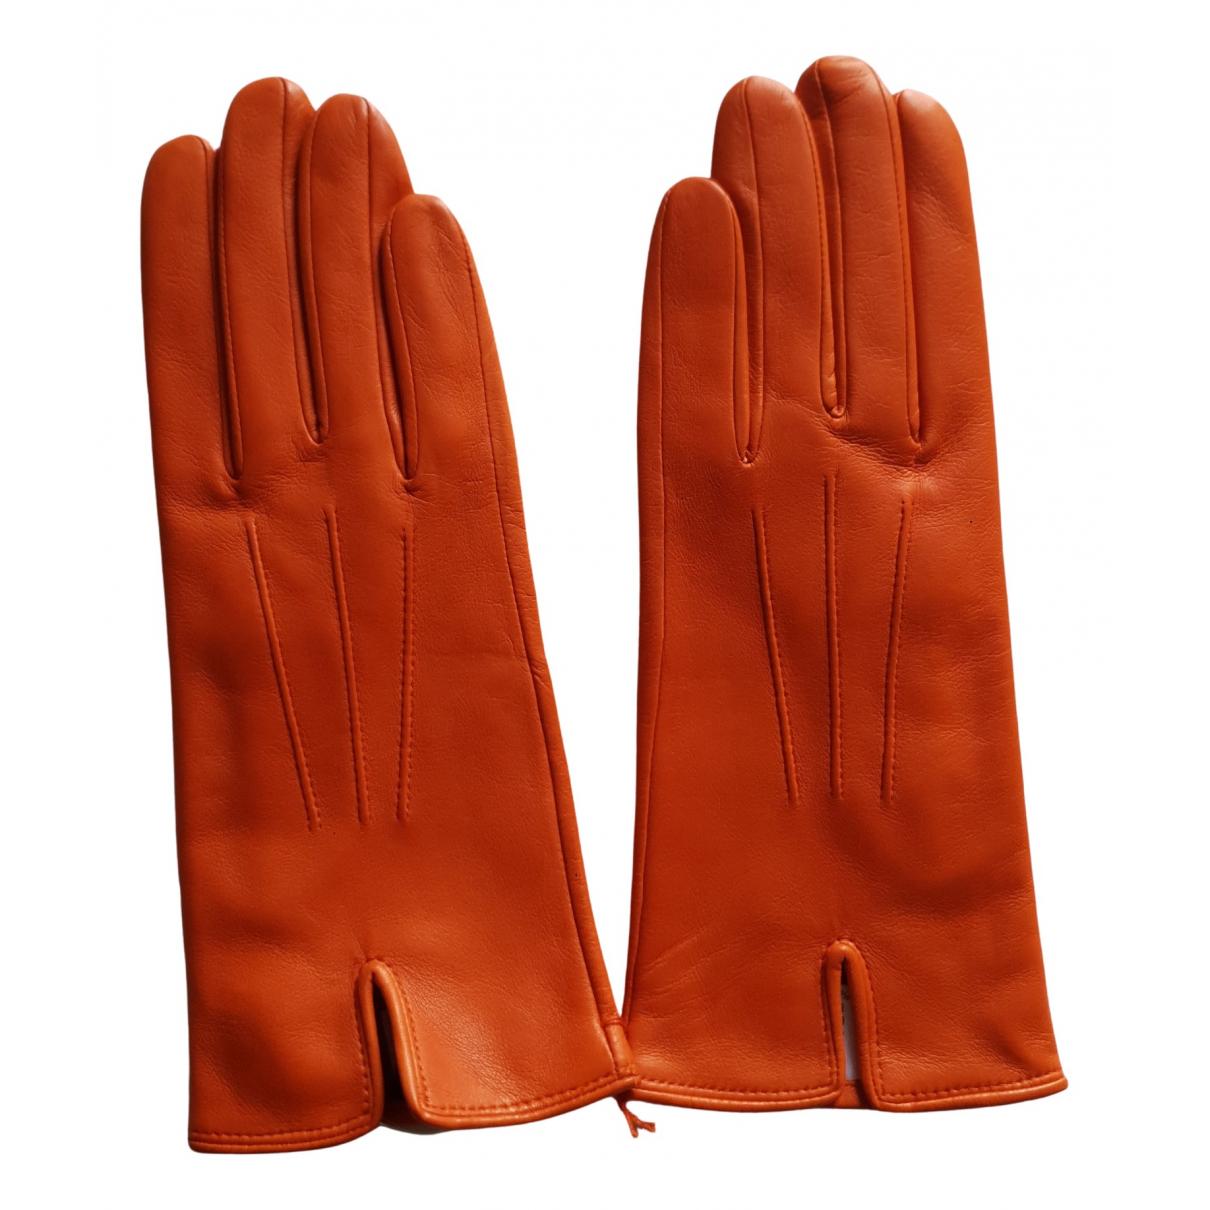 Sermoneta Gloves \N Orange Leather Gloves for Women 6.5 Inches